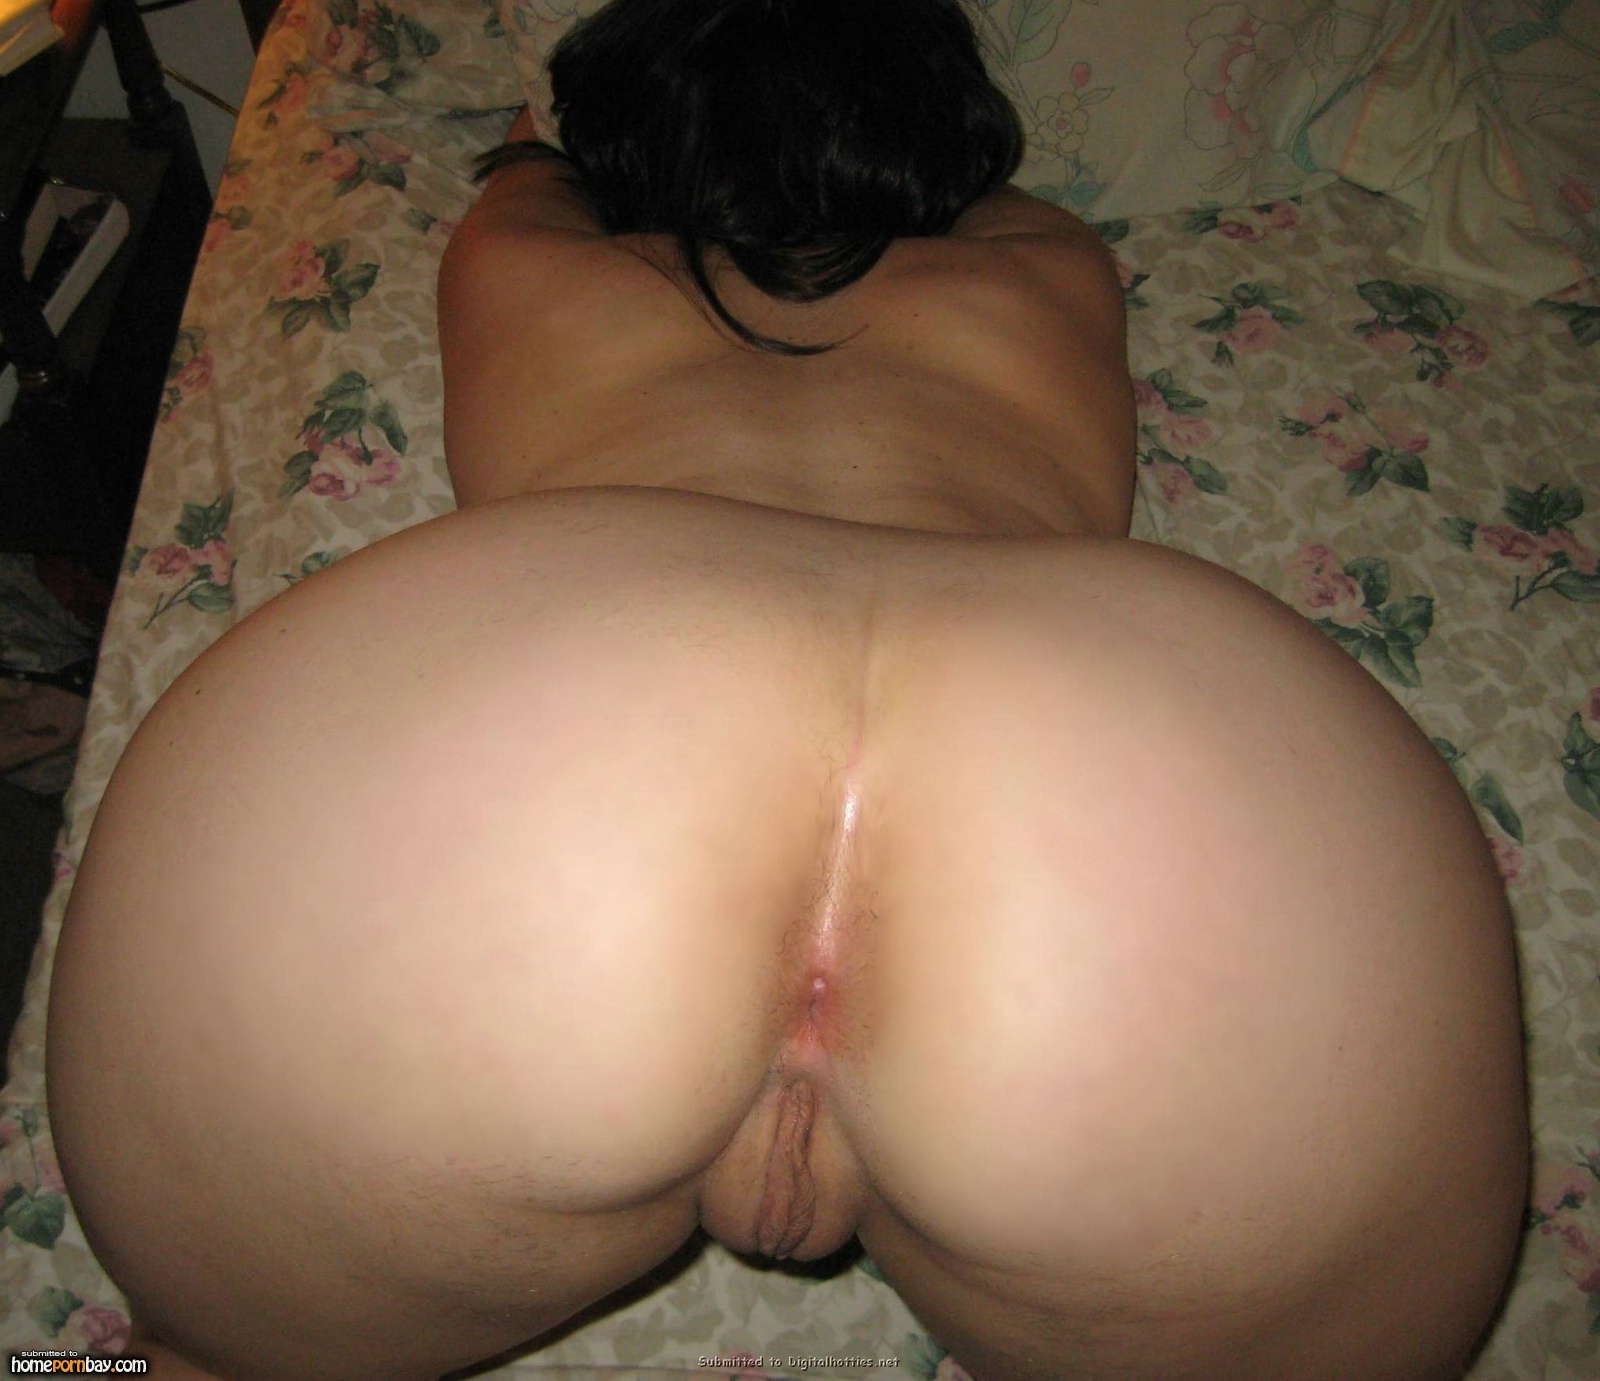 mature butt porn Work Search: tip: lex m/m (mature OR explicit) .